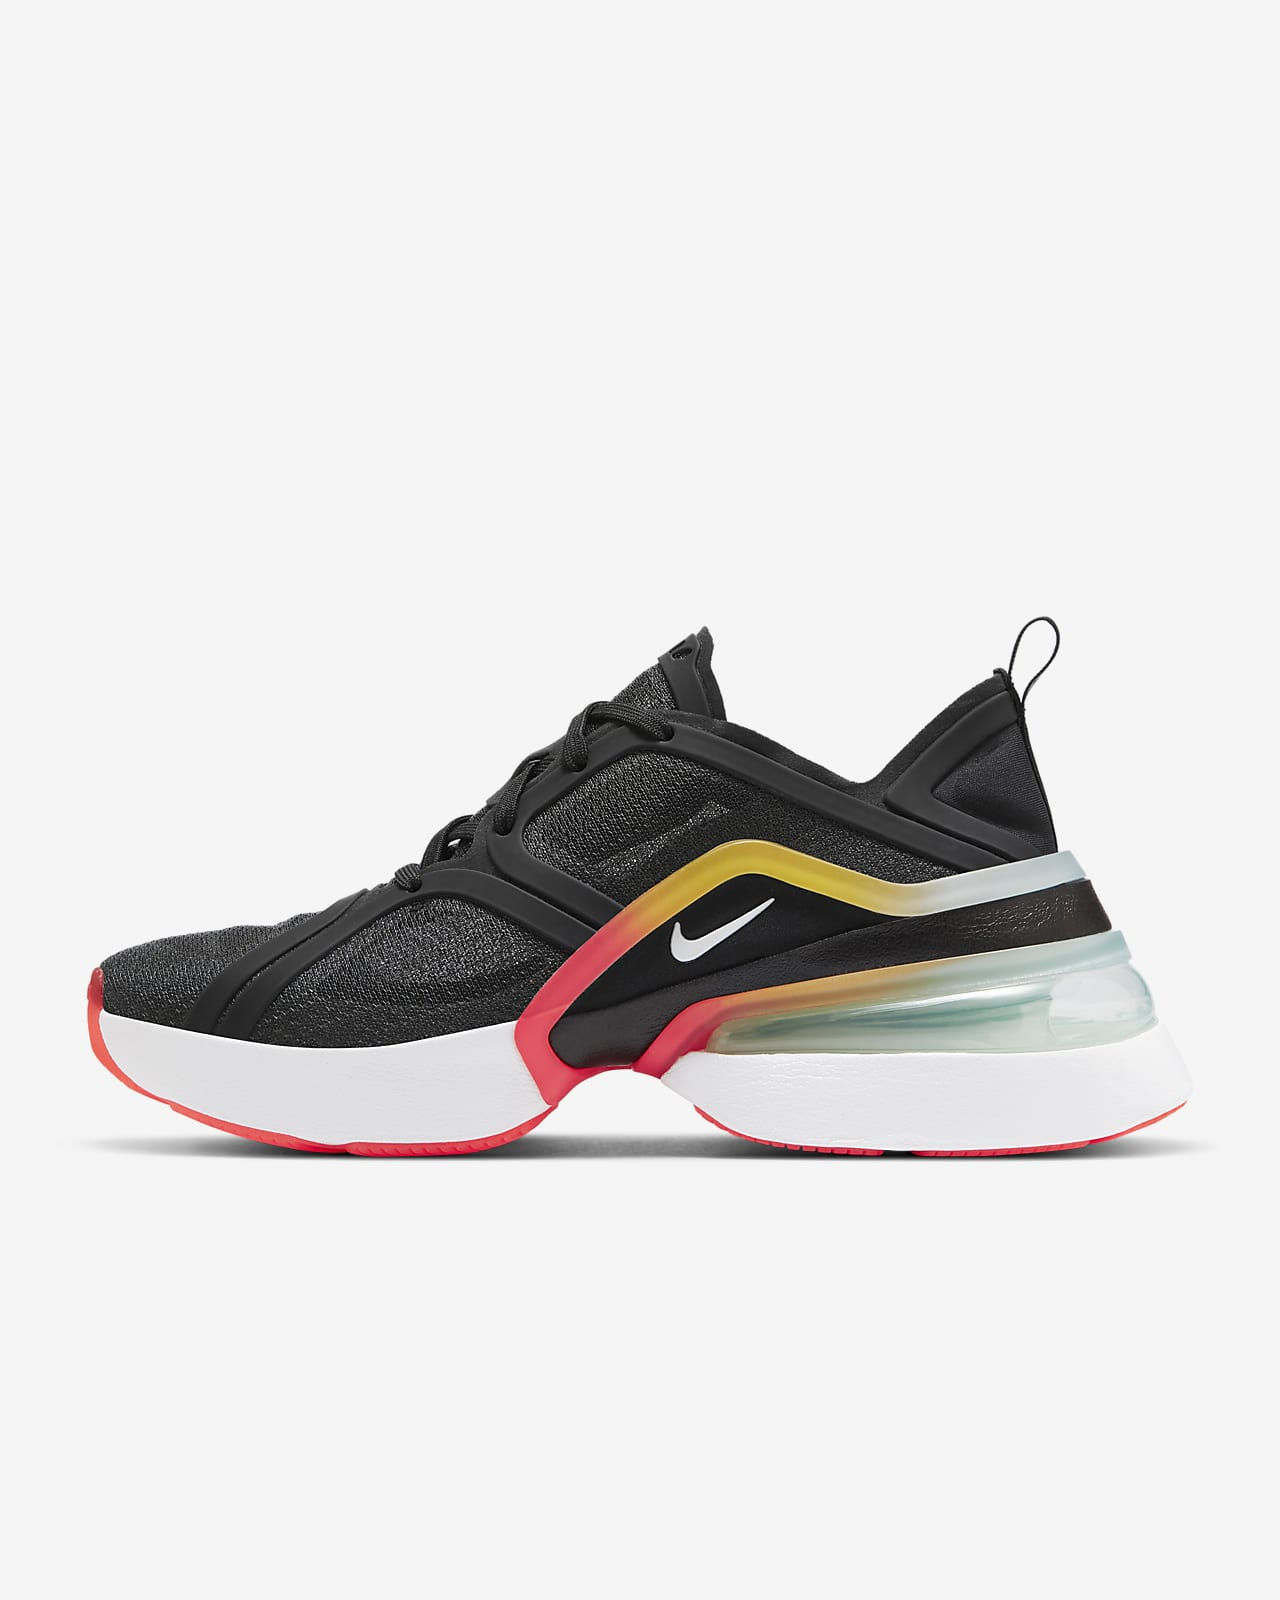 Nike Air Max 270 XX sko til dame